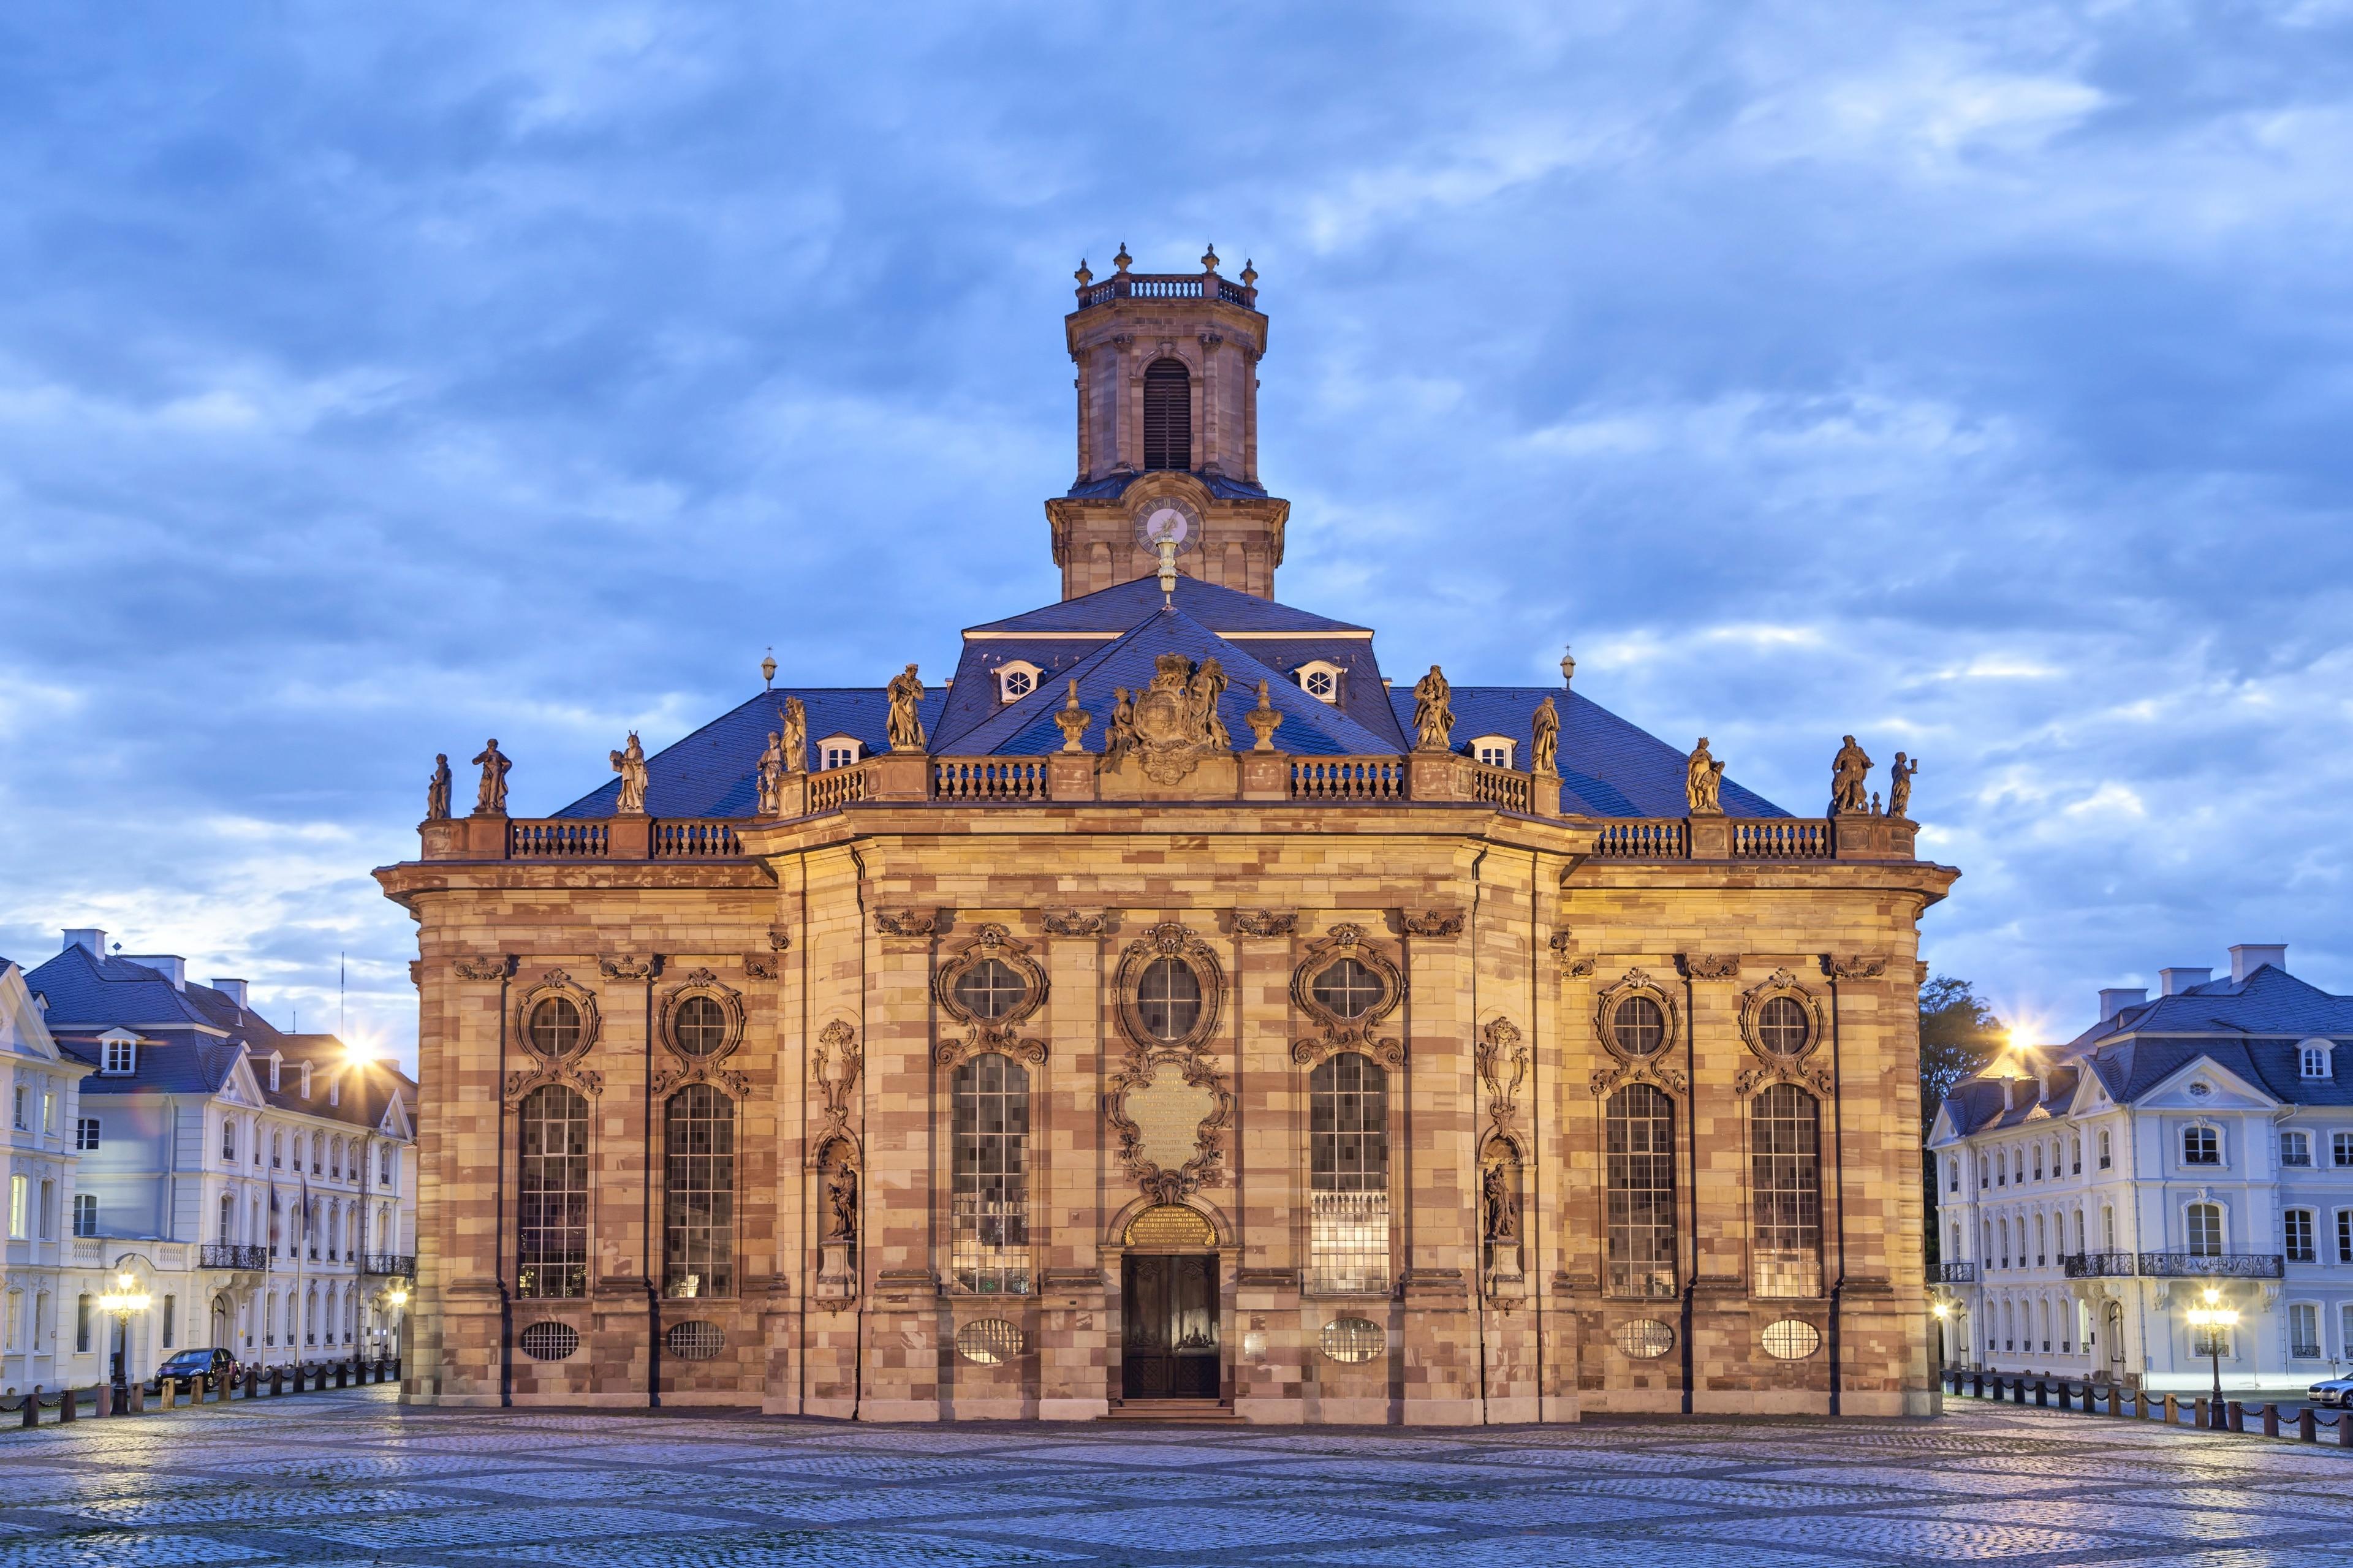 Ludwigskirche, Saarbruecken, Saarland, Germany